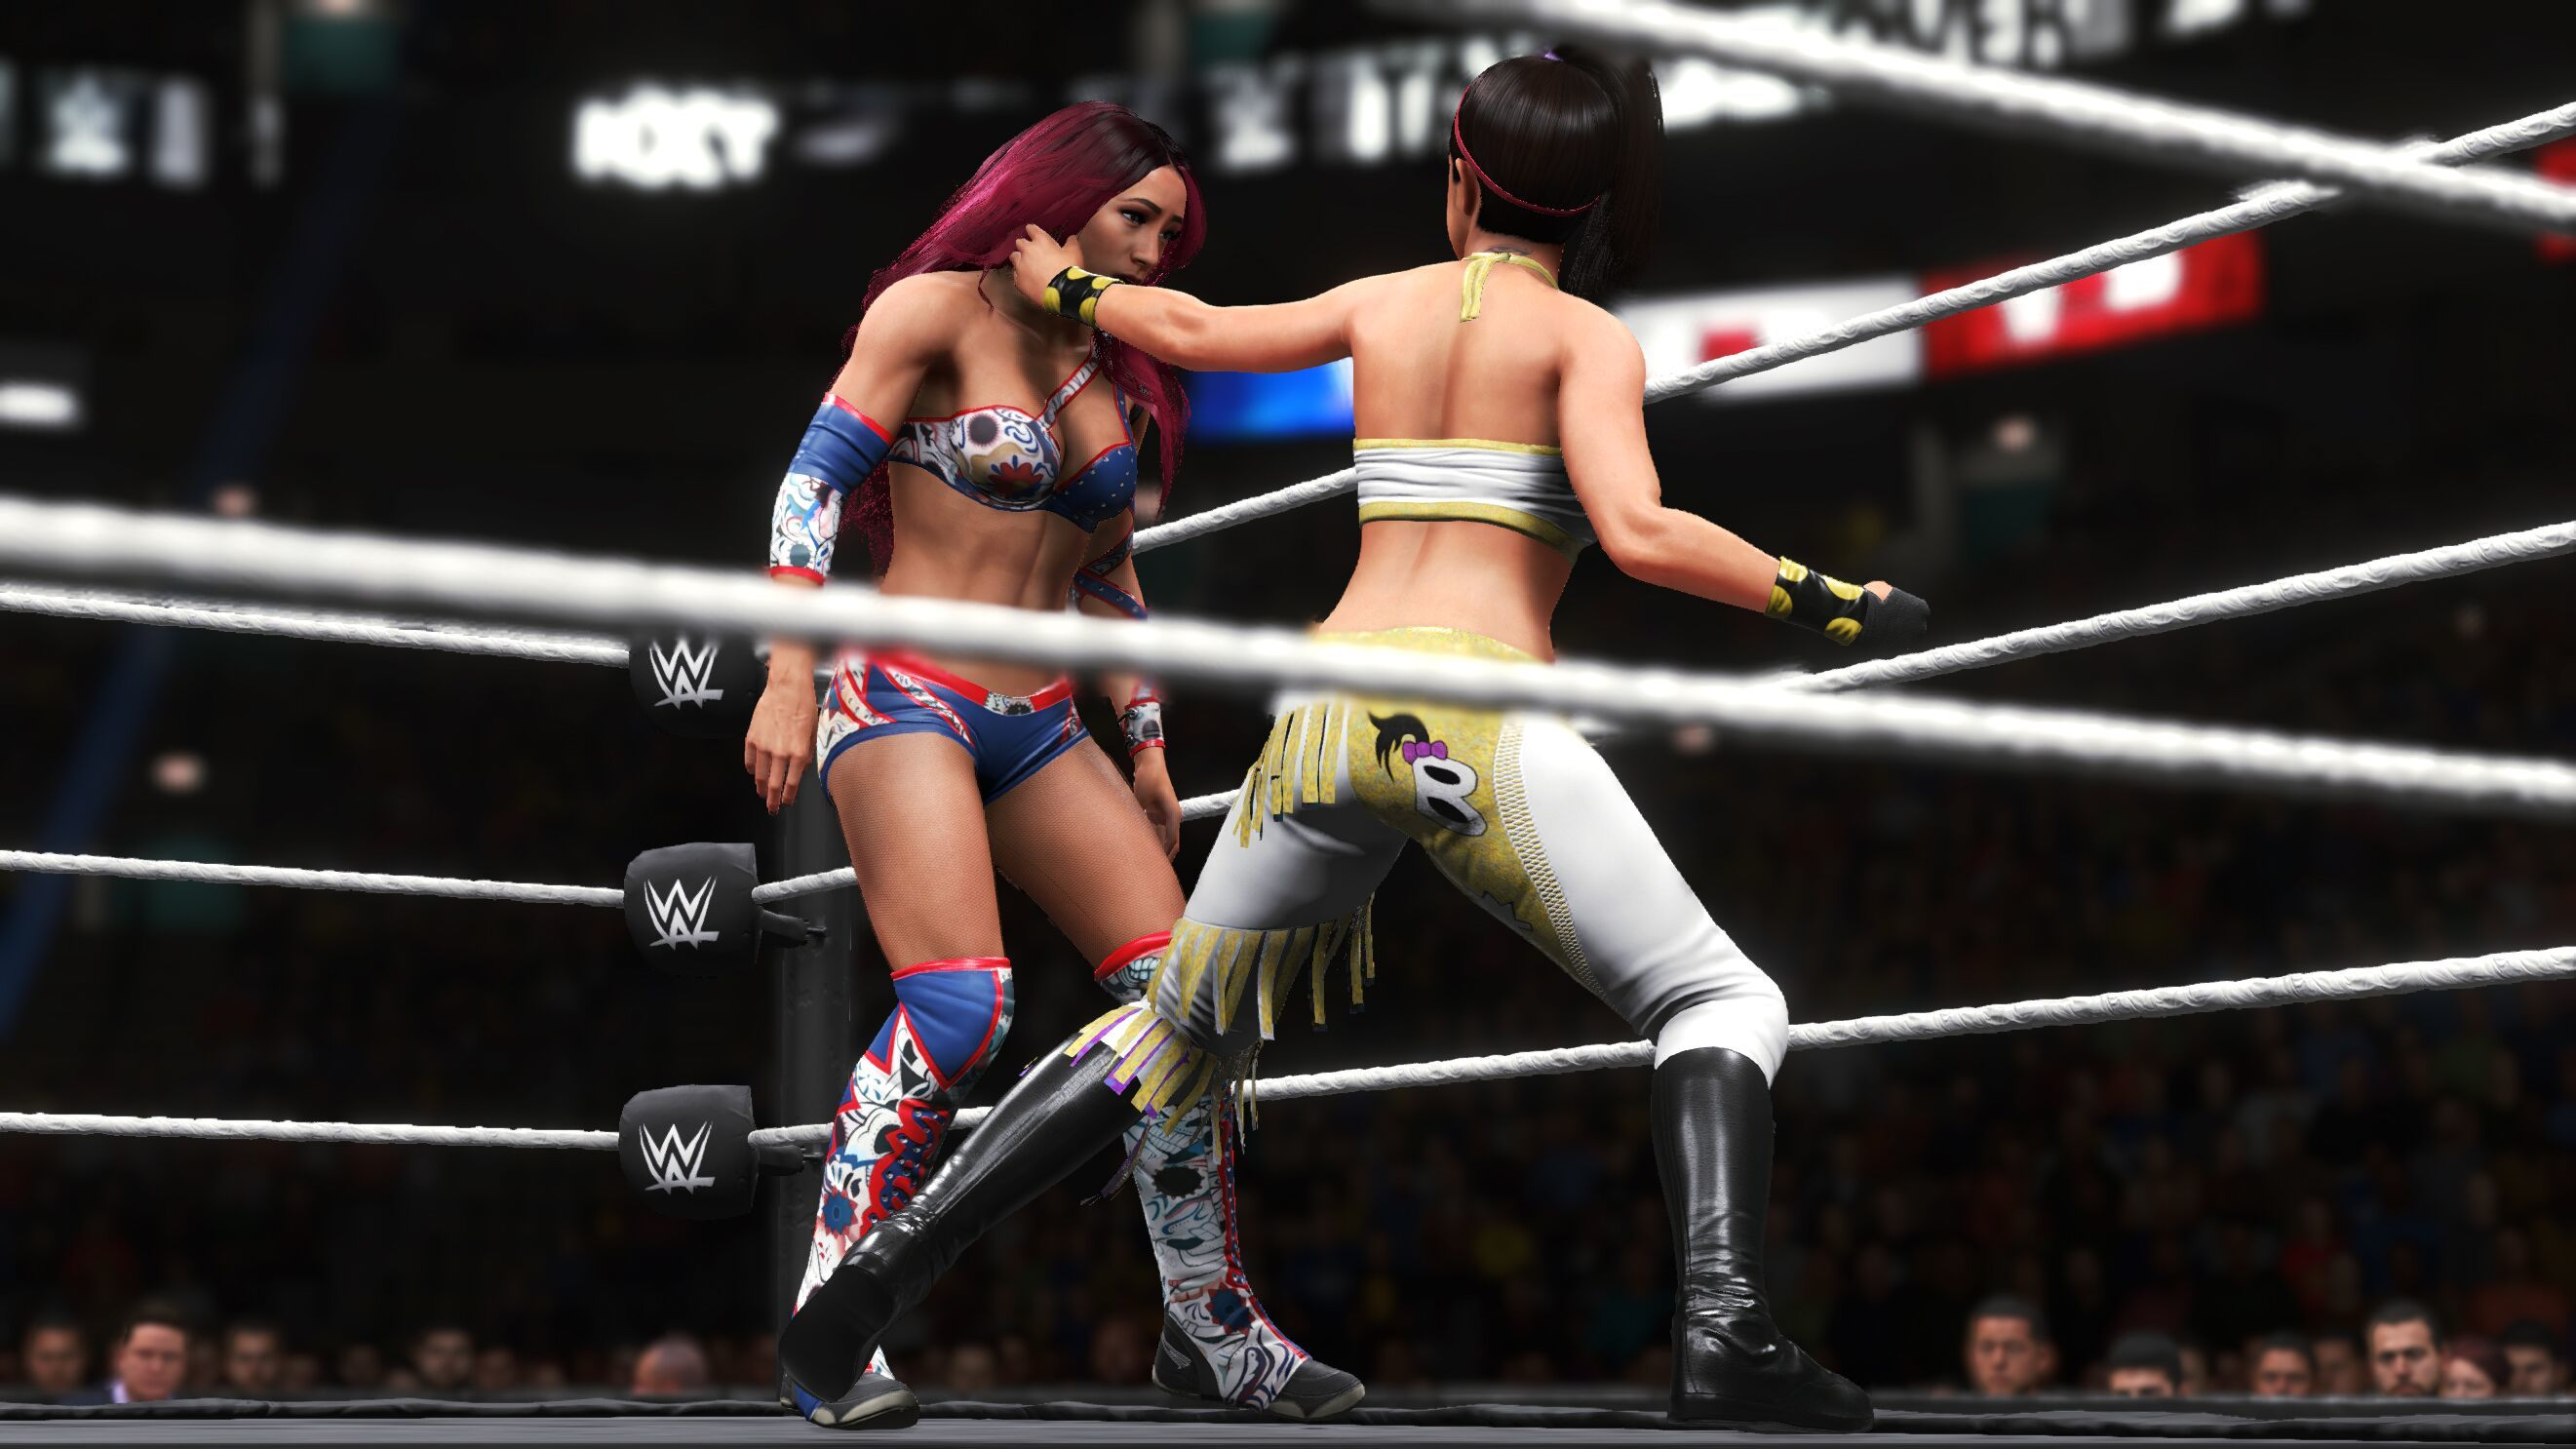 hur du slГҐr pГҐ bakgrunden matchmaking i WWE 2k15